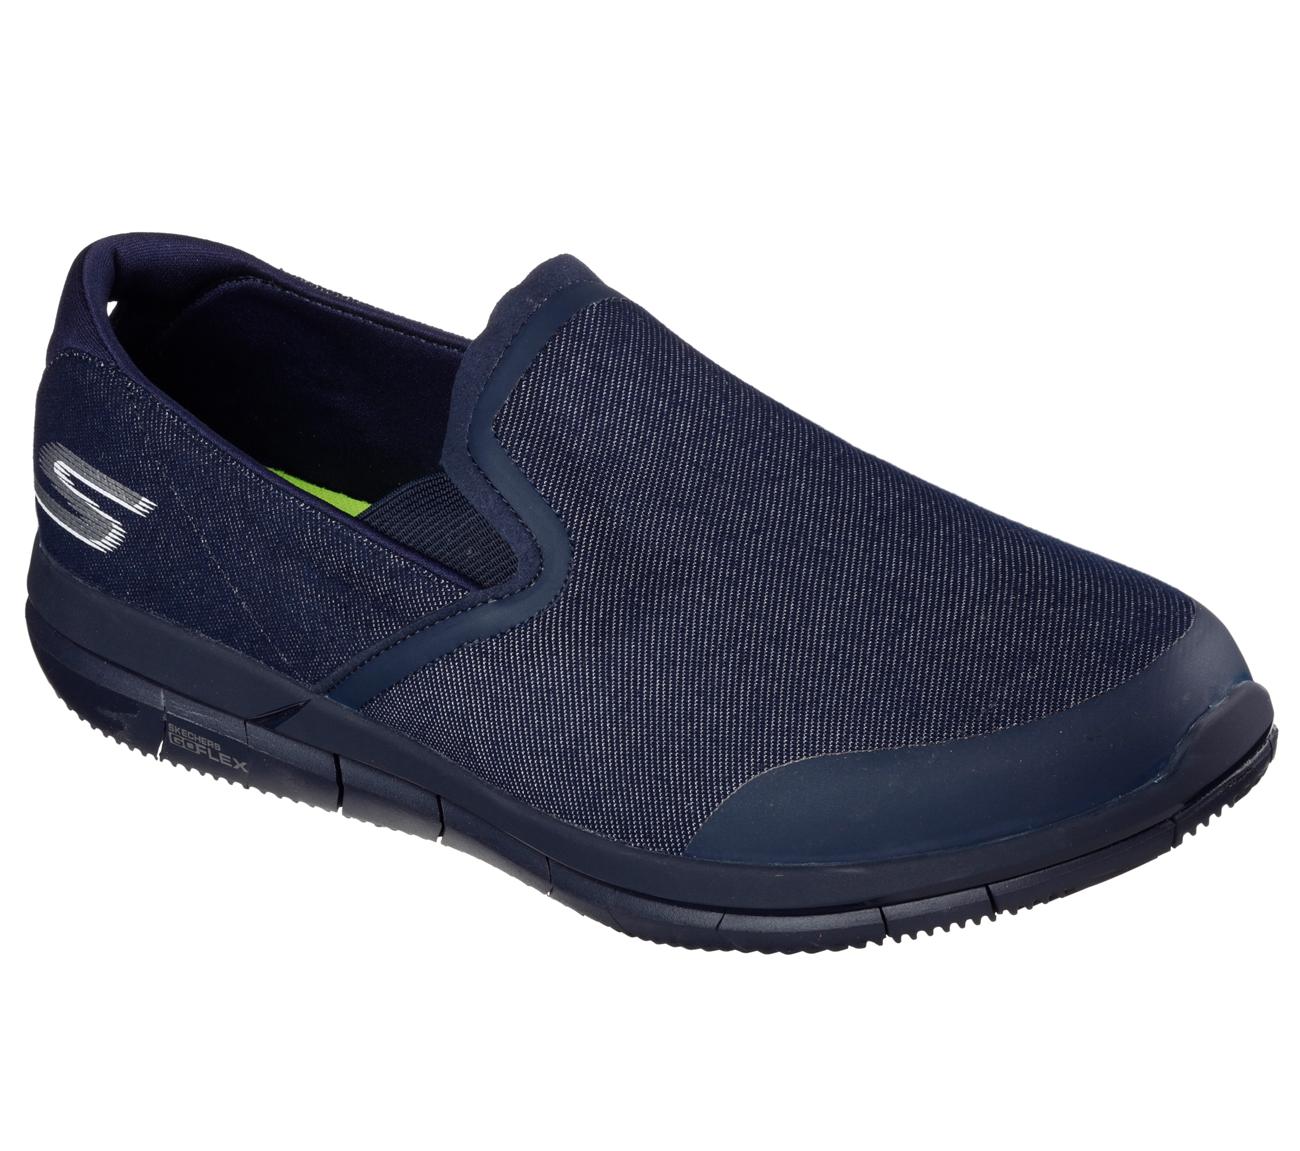 buy skechers skechers go flex executive skechers performance shoes only. Black Bedroom Furniture Sets. Home Design Ideas